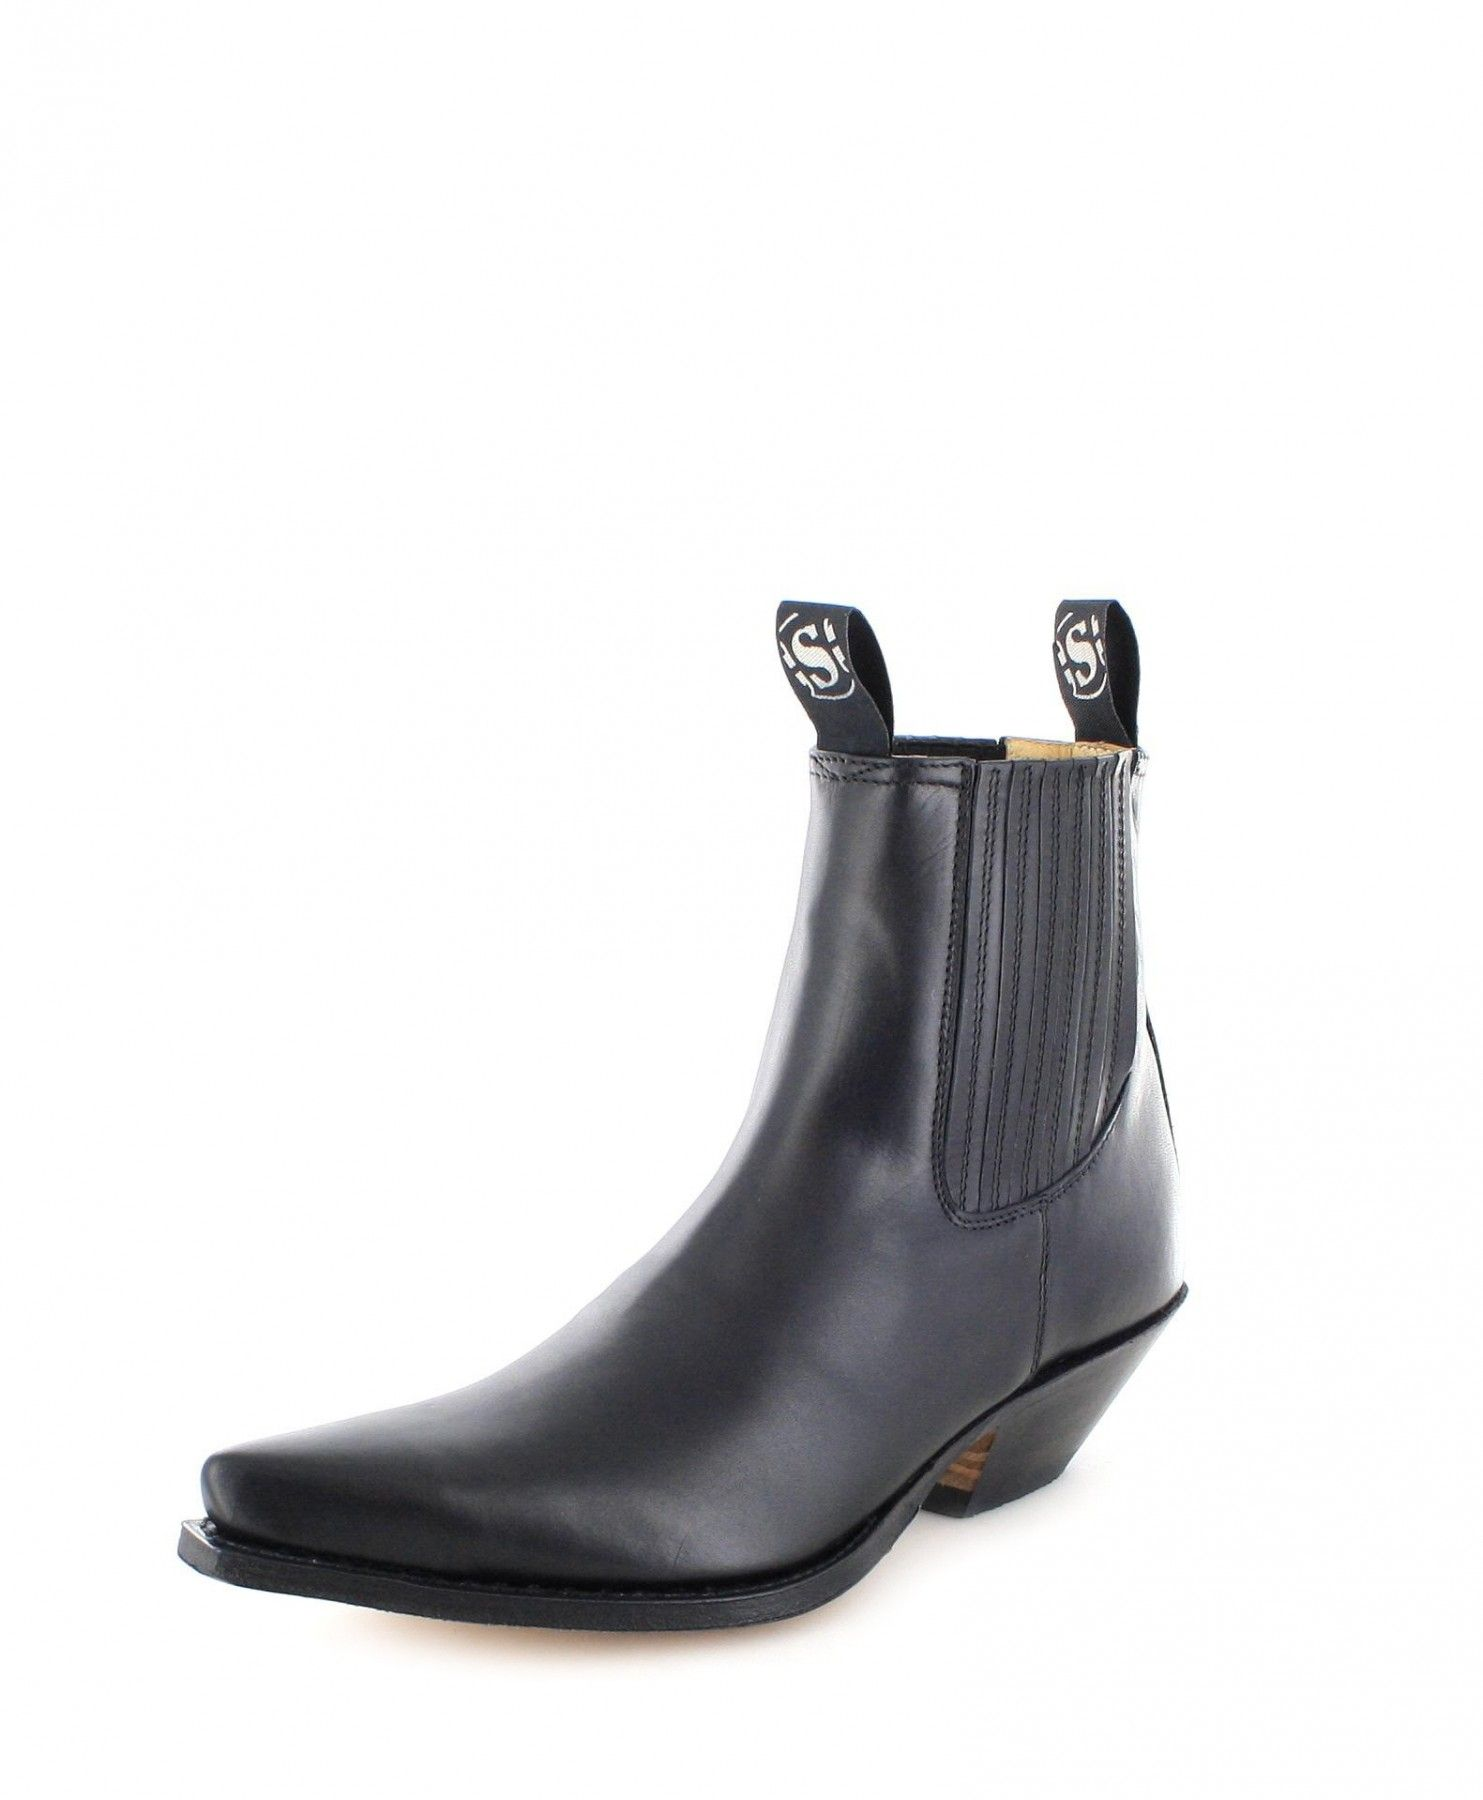 Sendra Boots 1692 braun Gr. 36 tD7bU3h